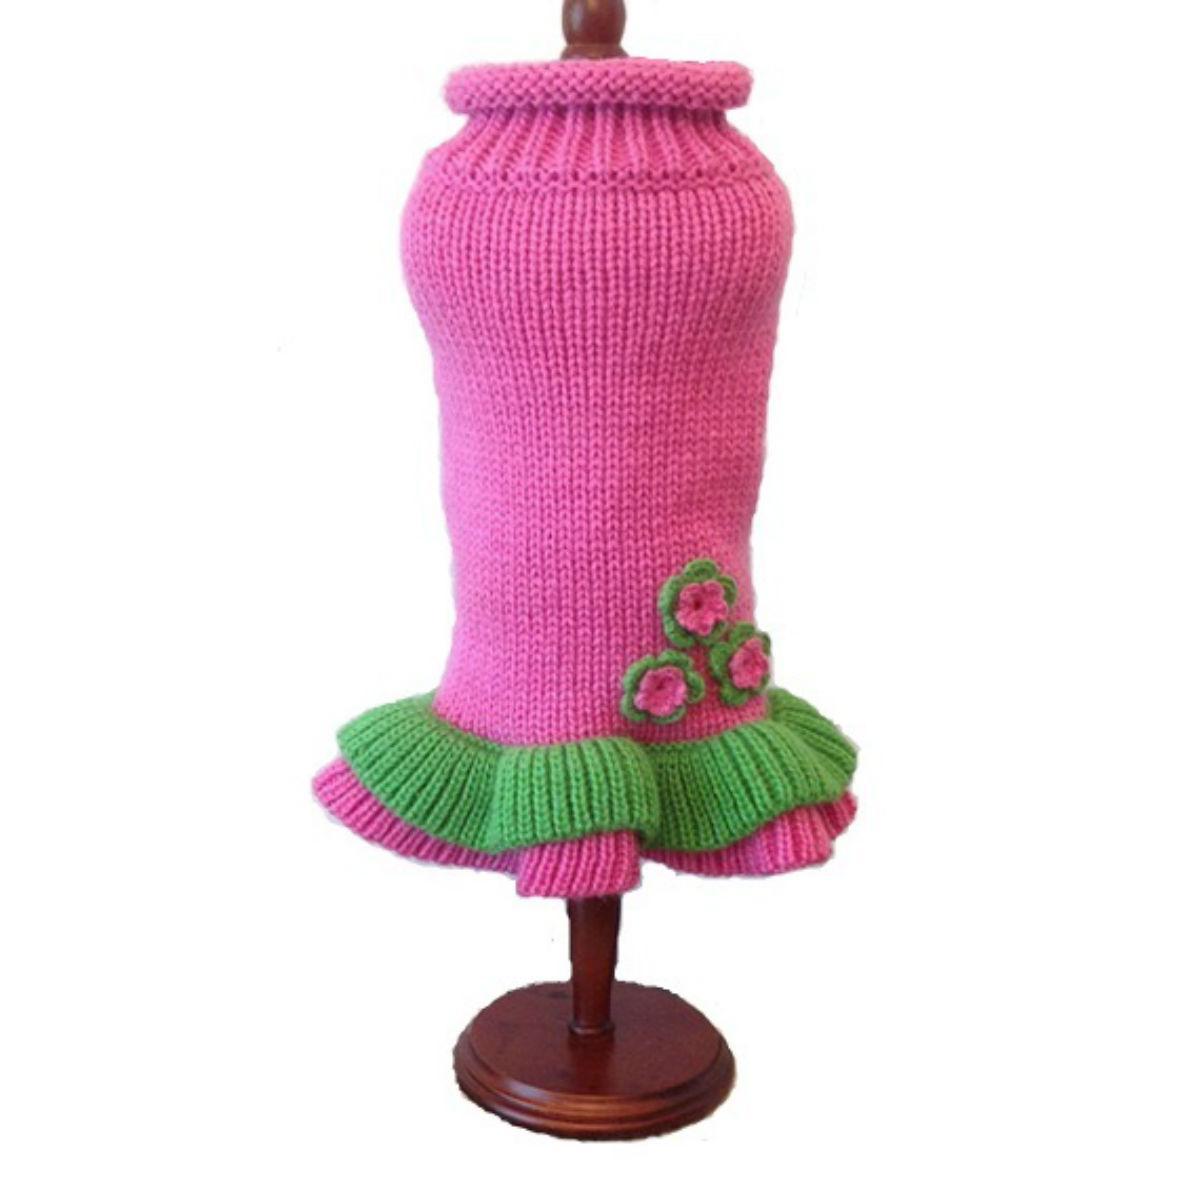 Dallas Dogs Girly Girl Dog Sweater Dress